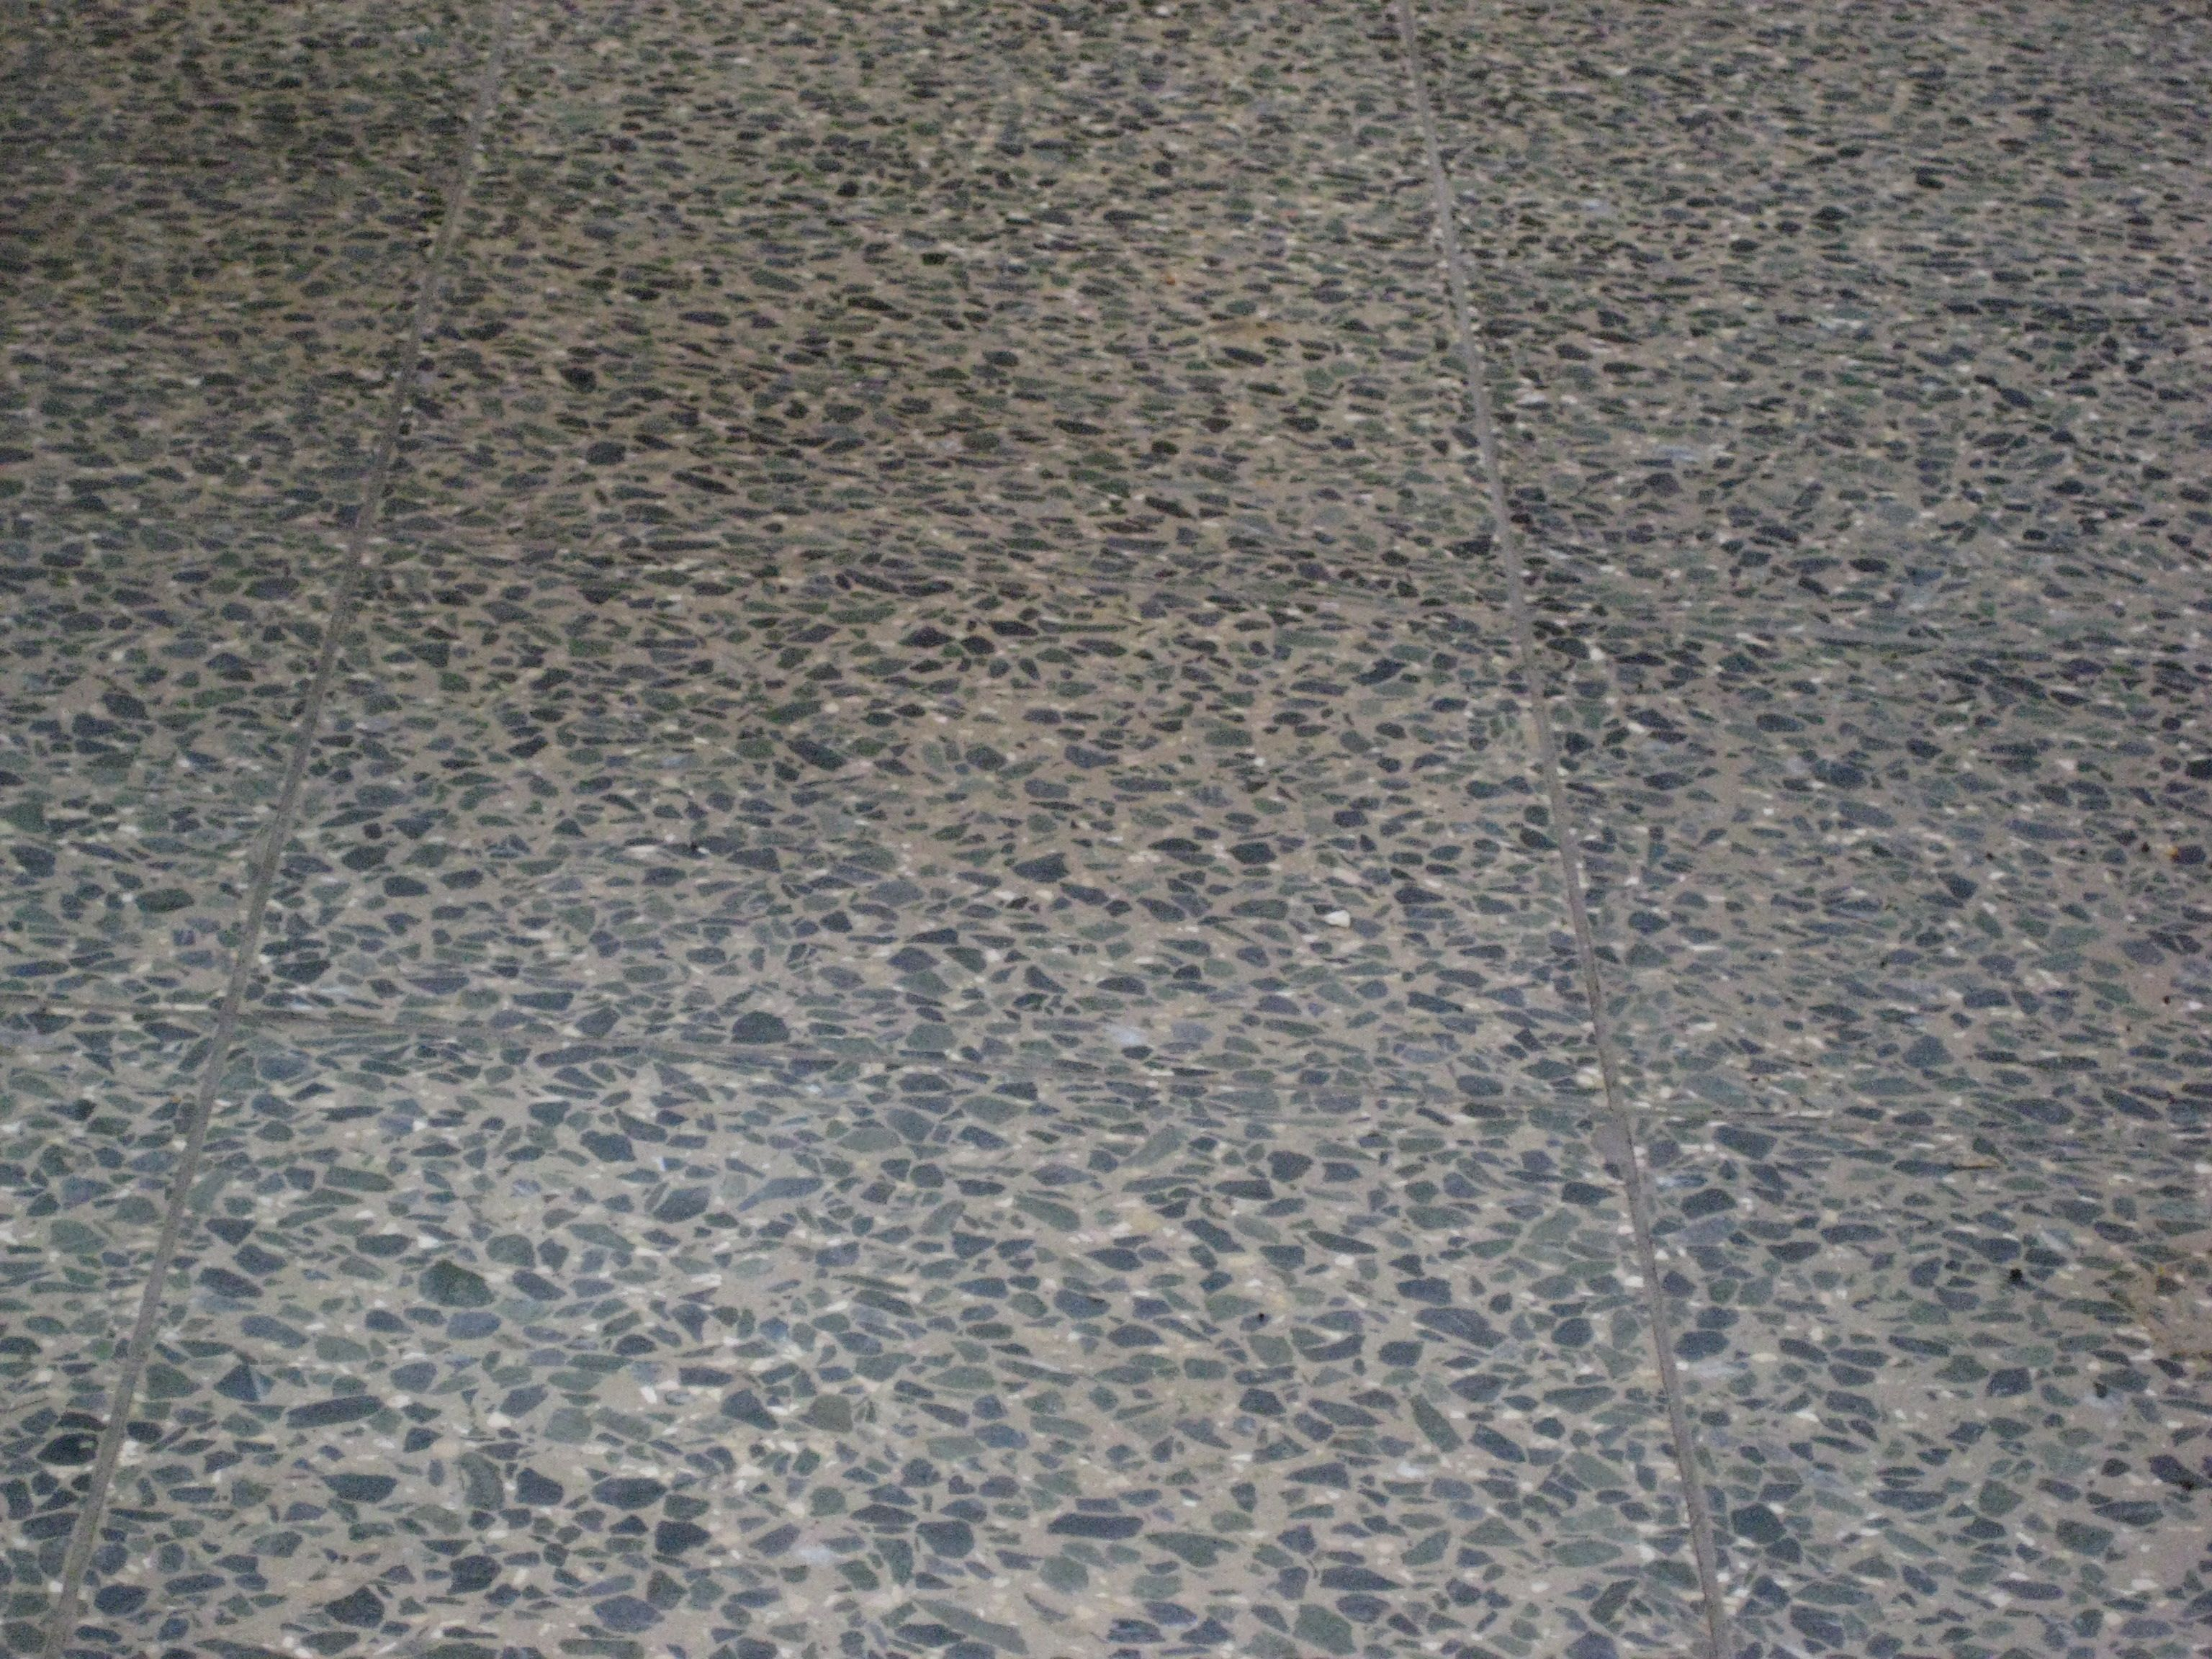 lichtgroen grijze granito tegels keuken tegels pinterest